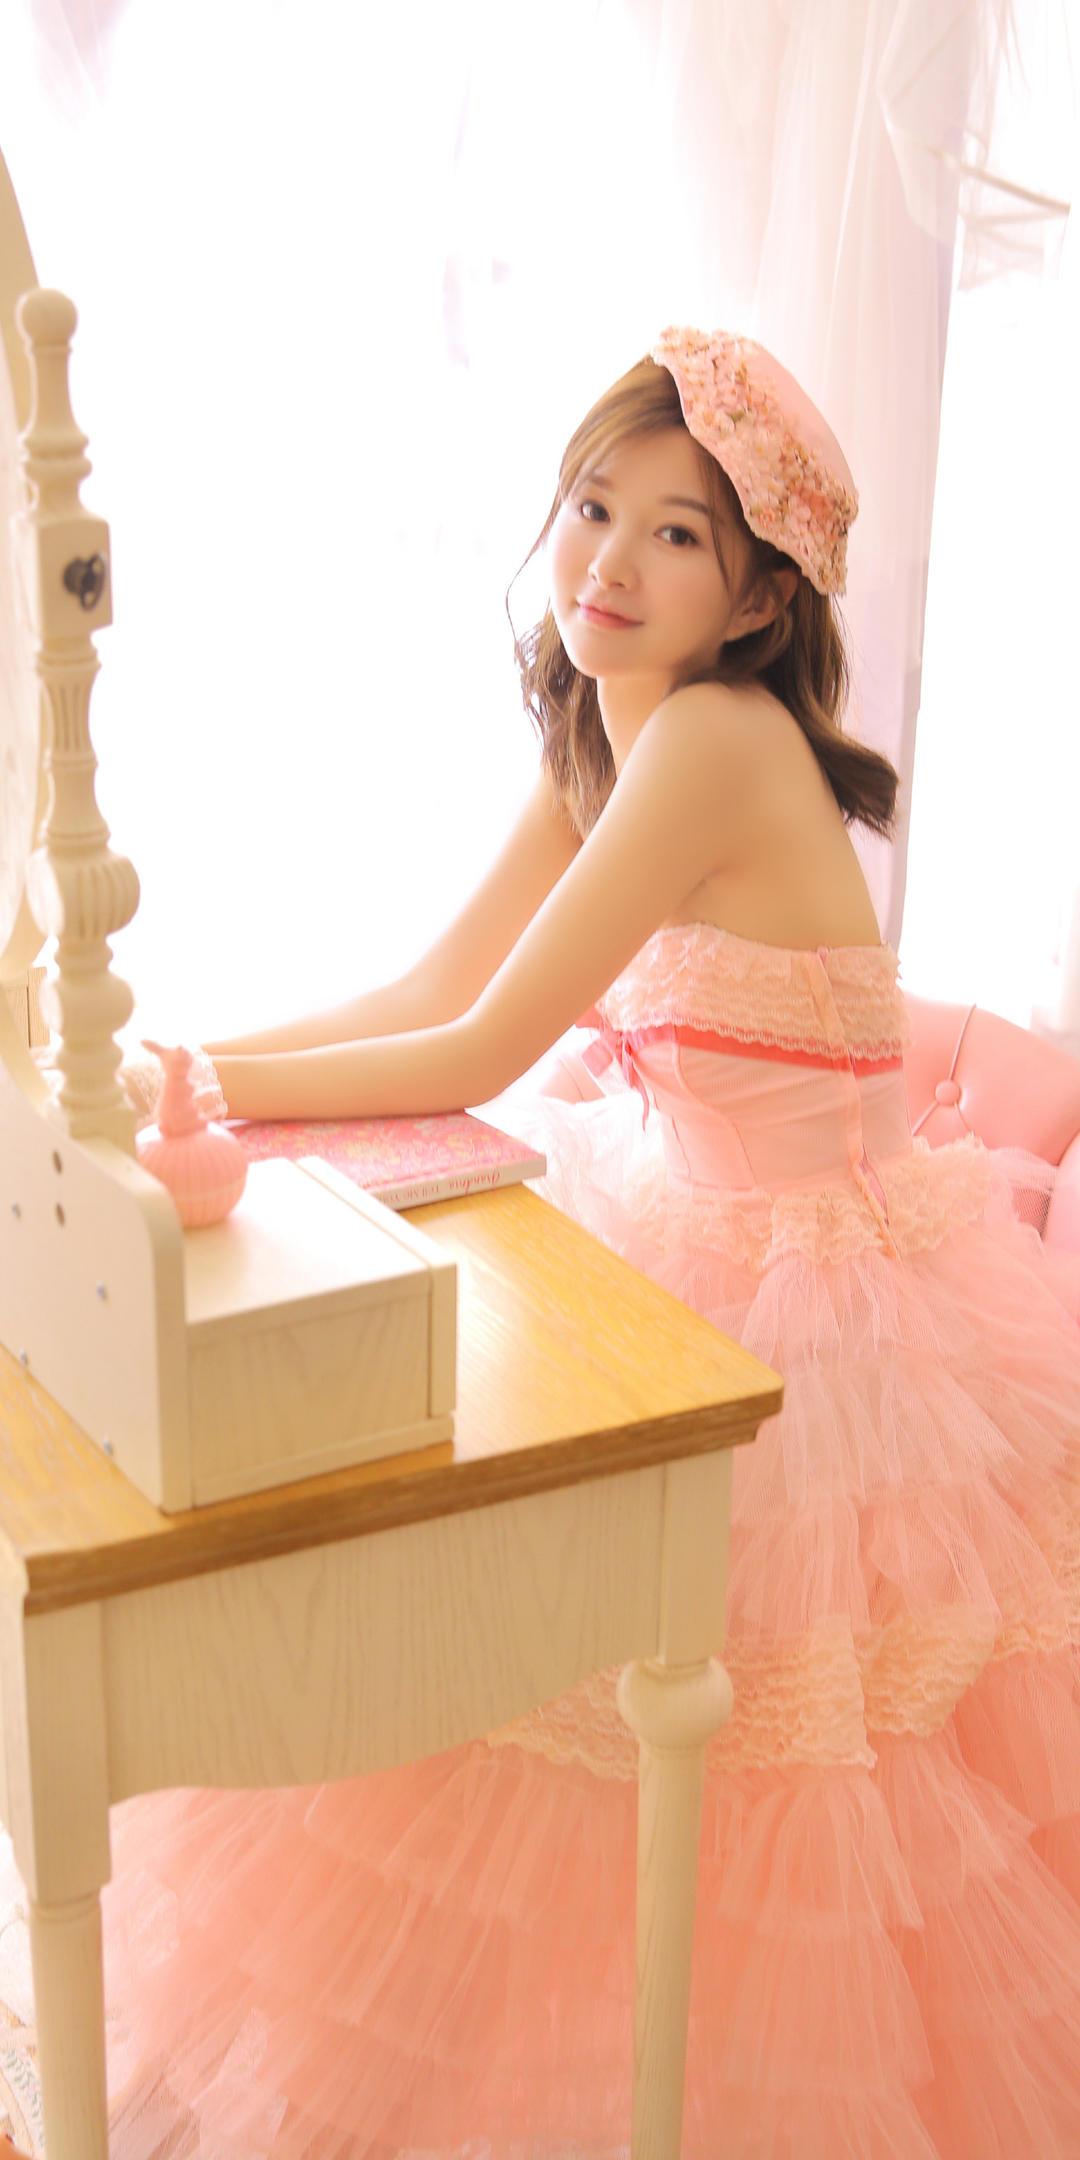 5e67b89704024 - 粉色系少女心手机壁纸